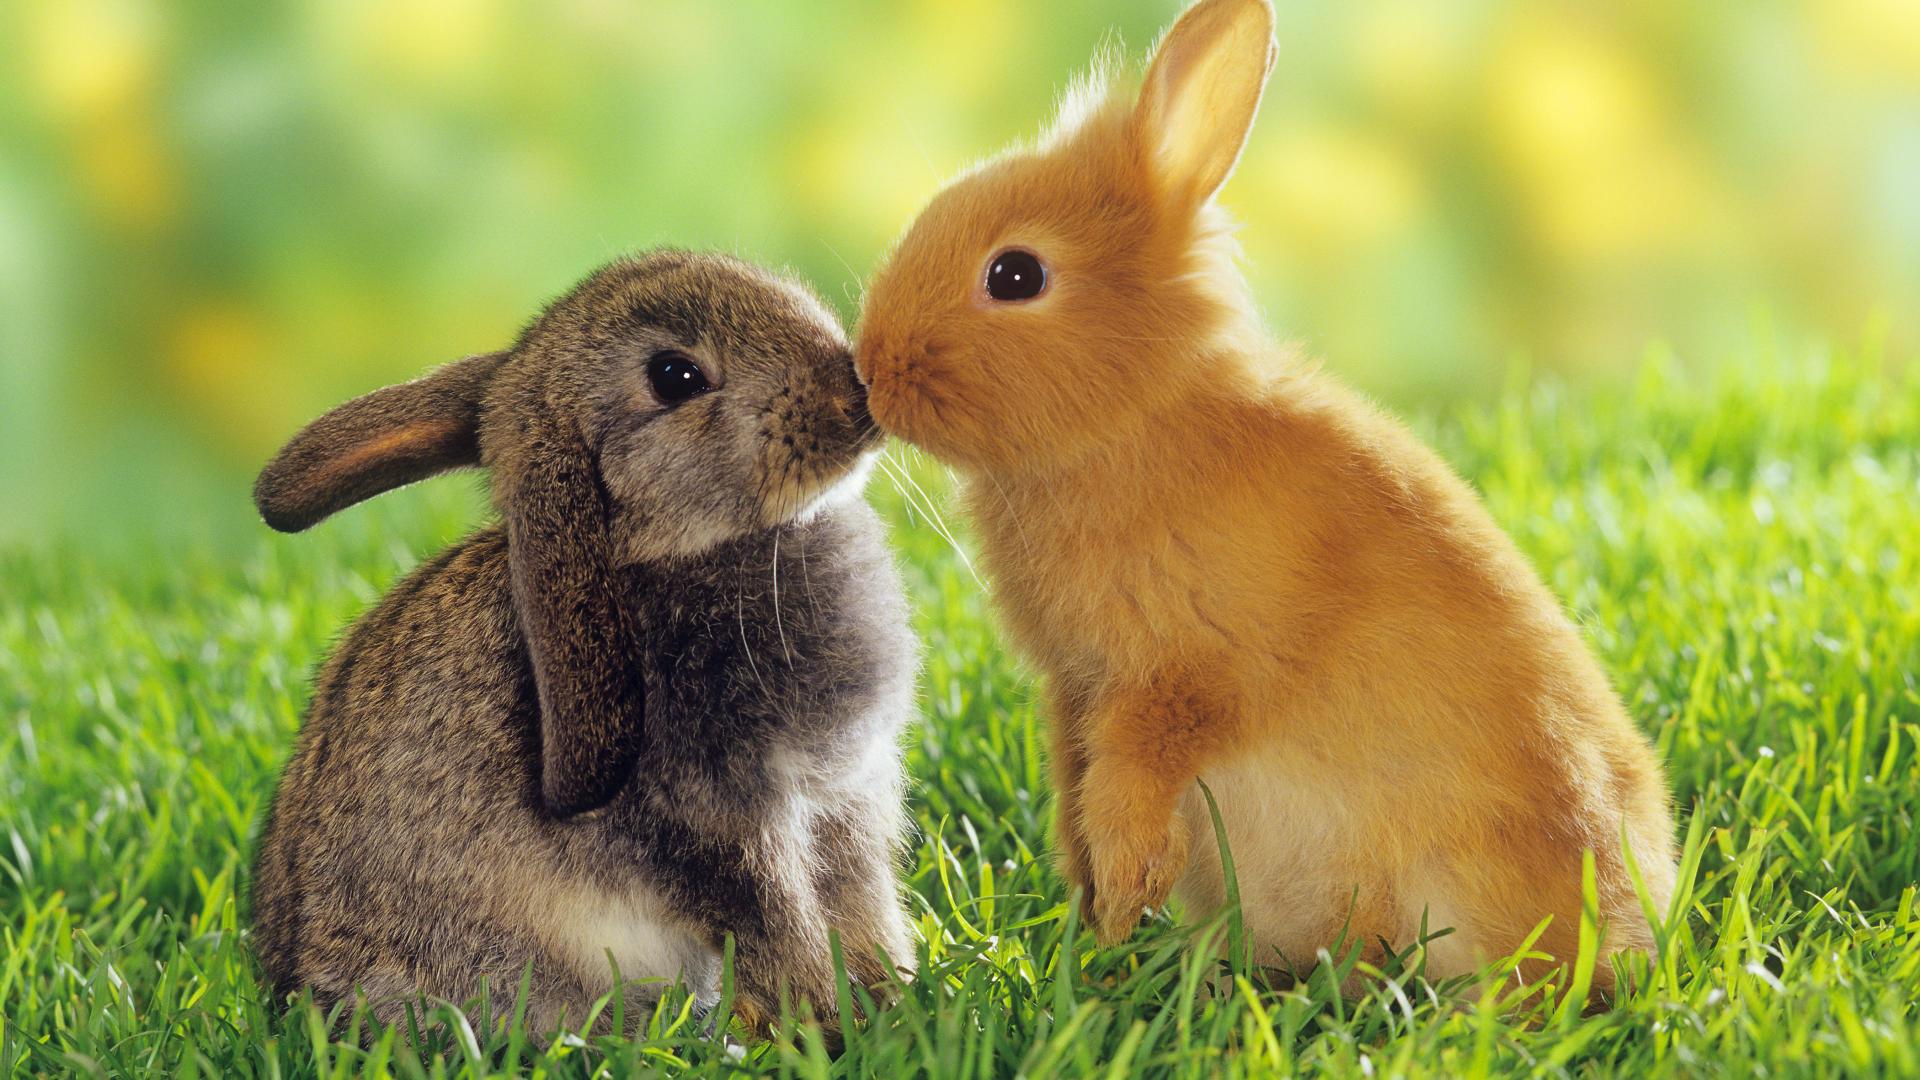 Cute Baby Rabbits Wallpapers